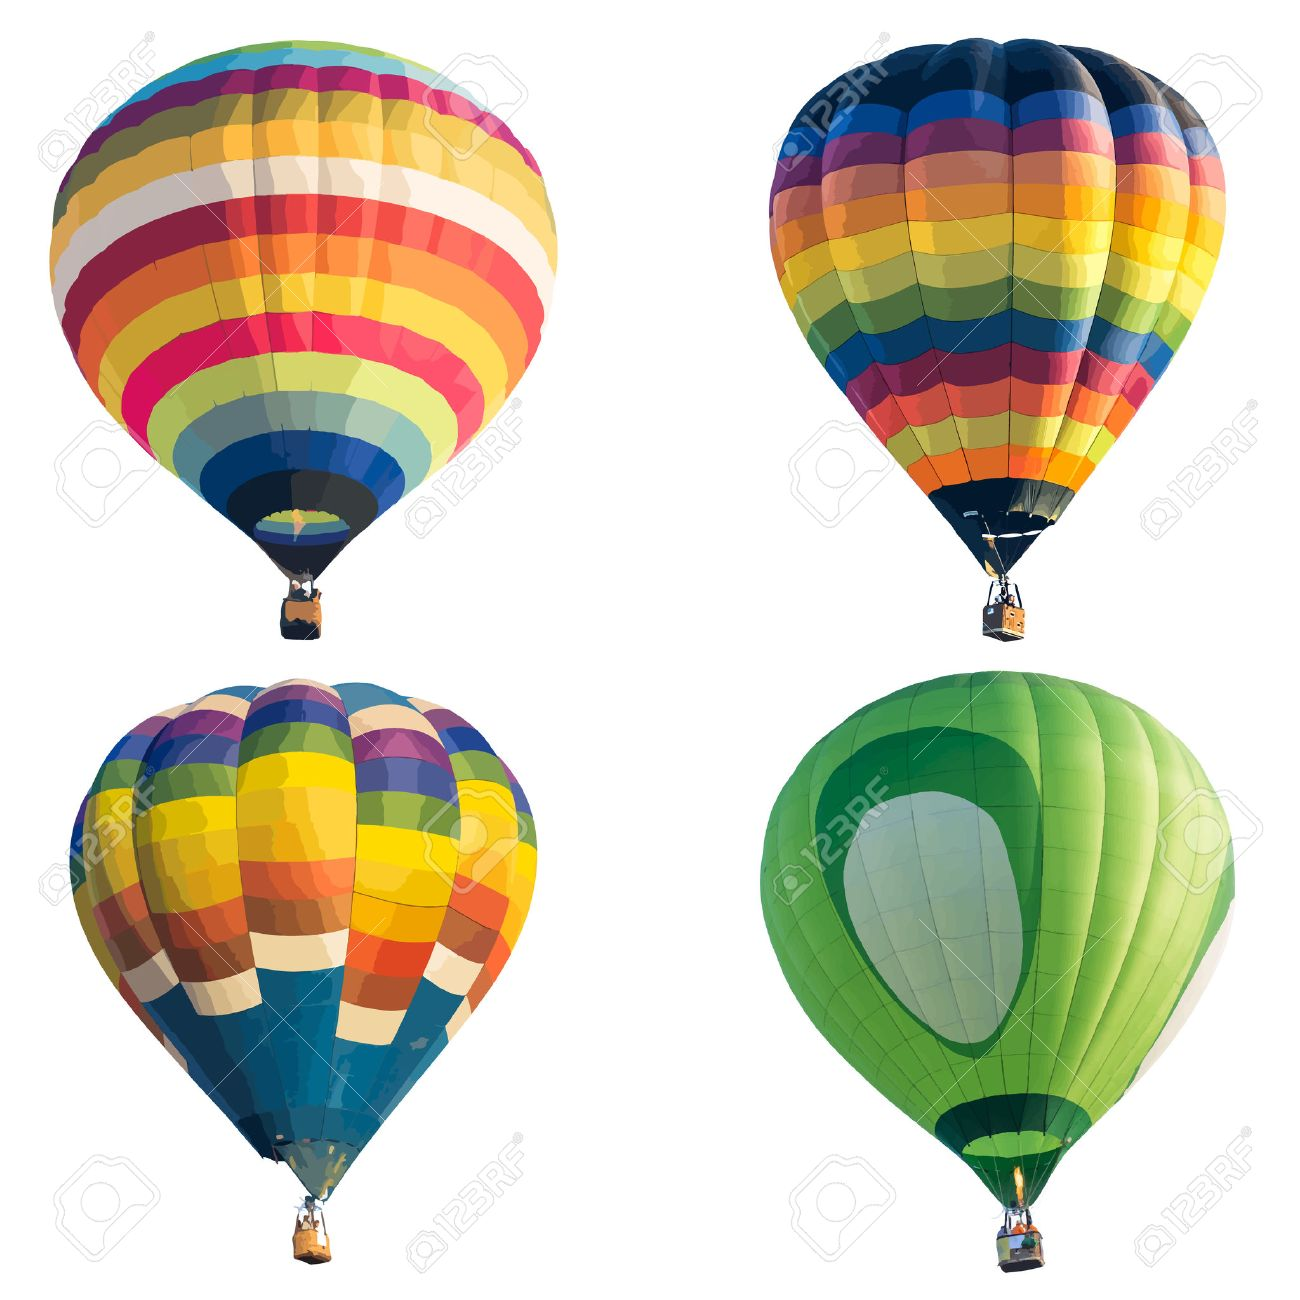 15 064 air balloon cliparts stock vector and royalty free